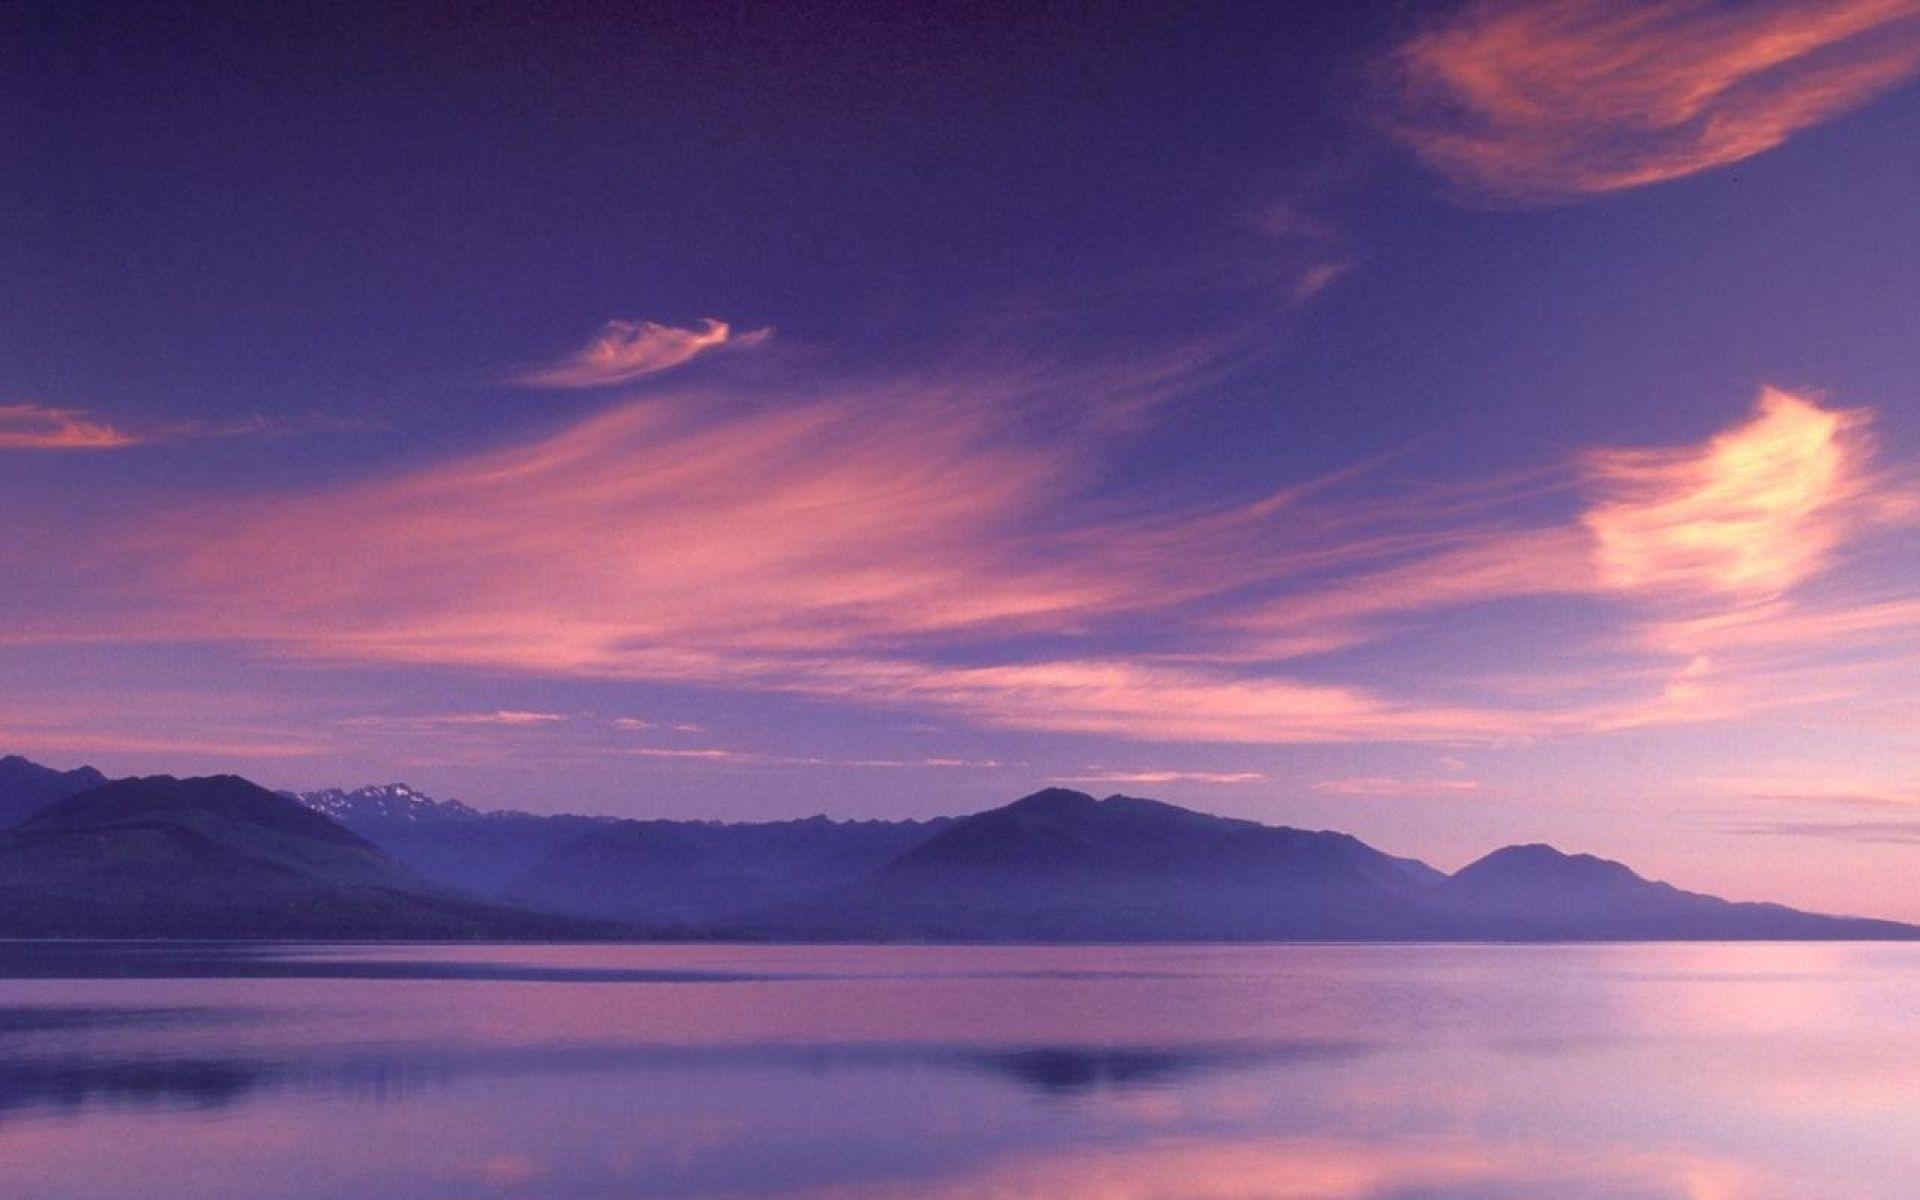 Originalwide Pink Sky Mountains & Sea Wallpapers - Desktop Background Sky Pink , HD Wallpaper & Backgrounds